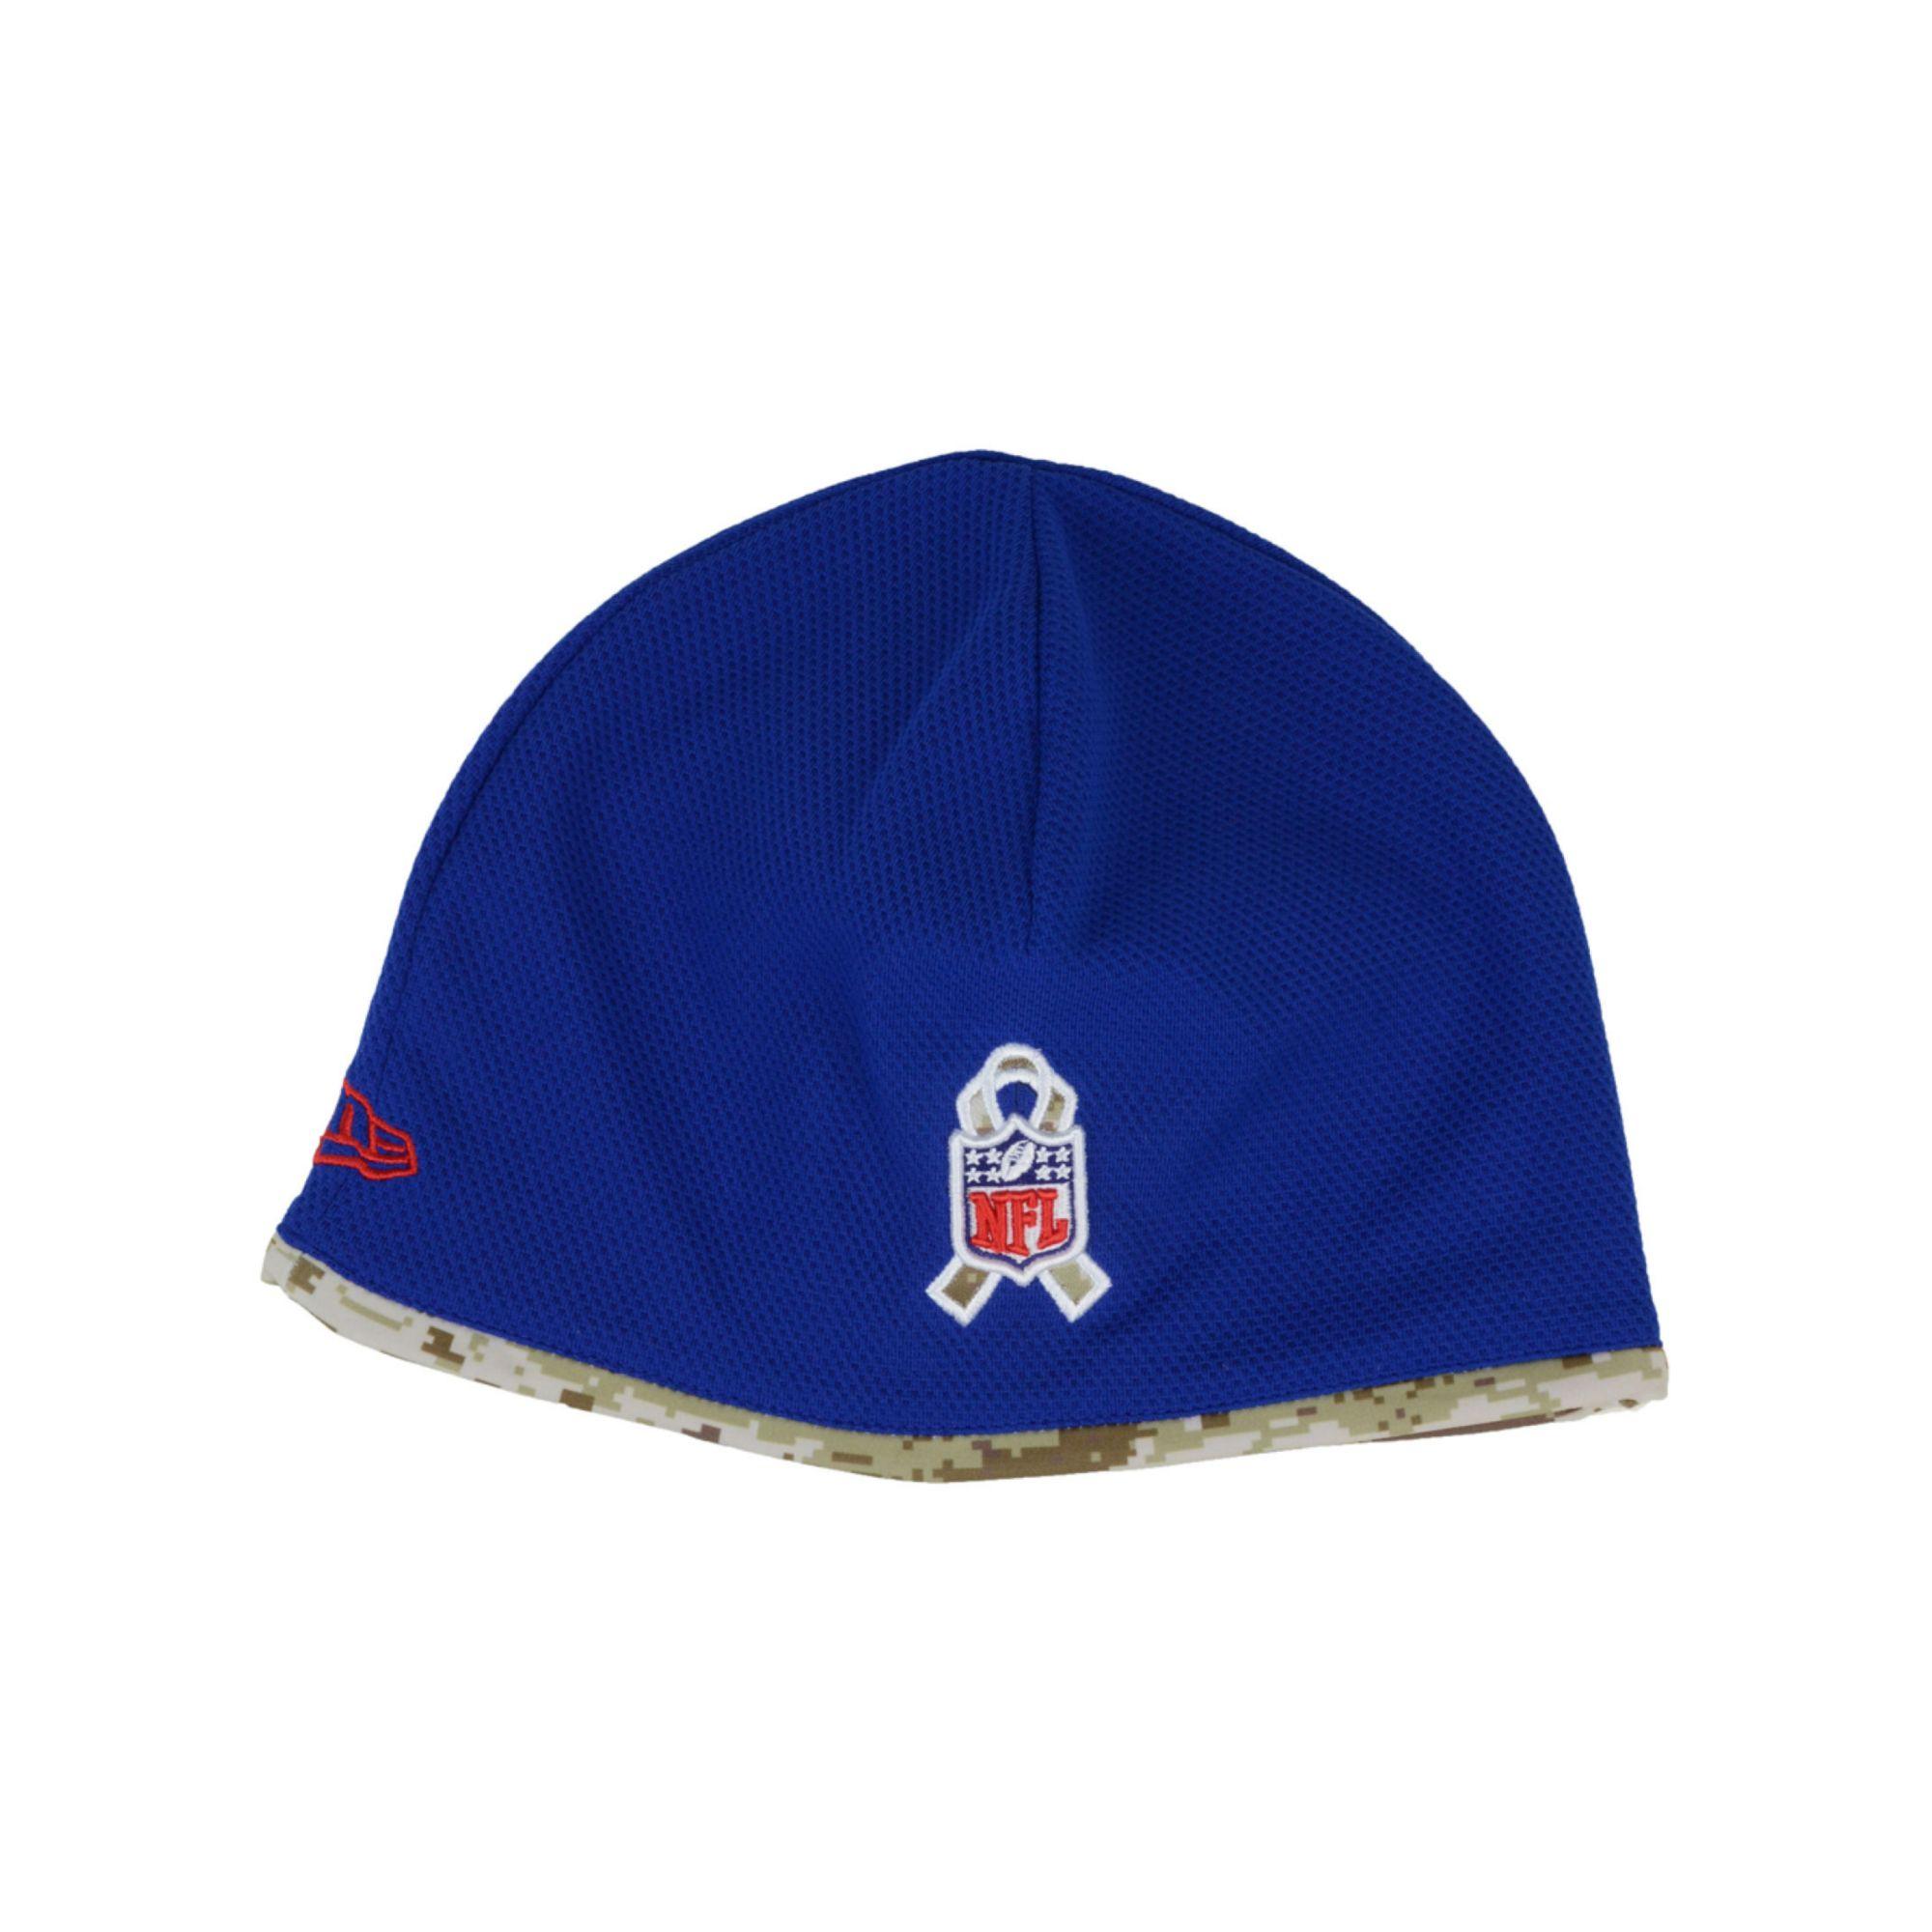 buy popular 4c0b2 e8a39 Lyst - KTZ New York Giants Salute To Service Tech Knit Hat in Blue ...